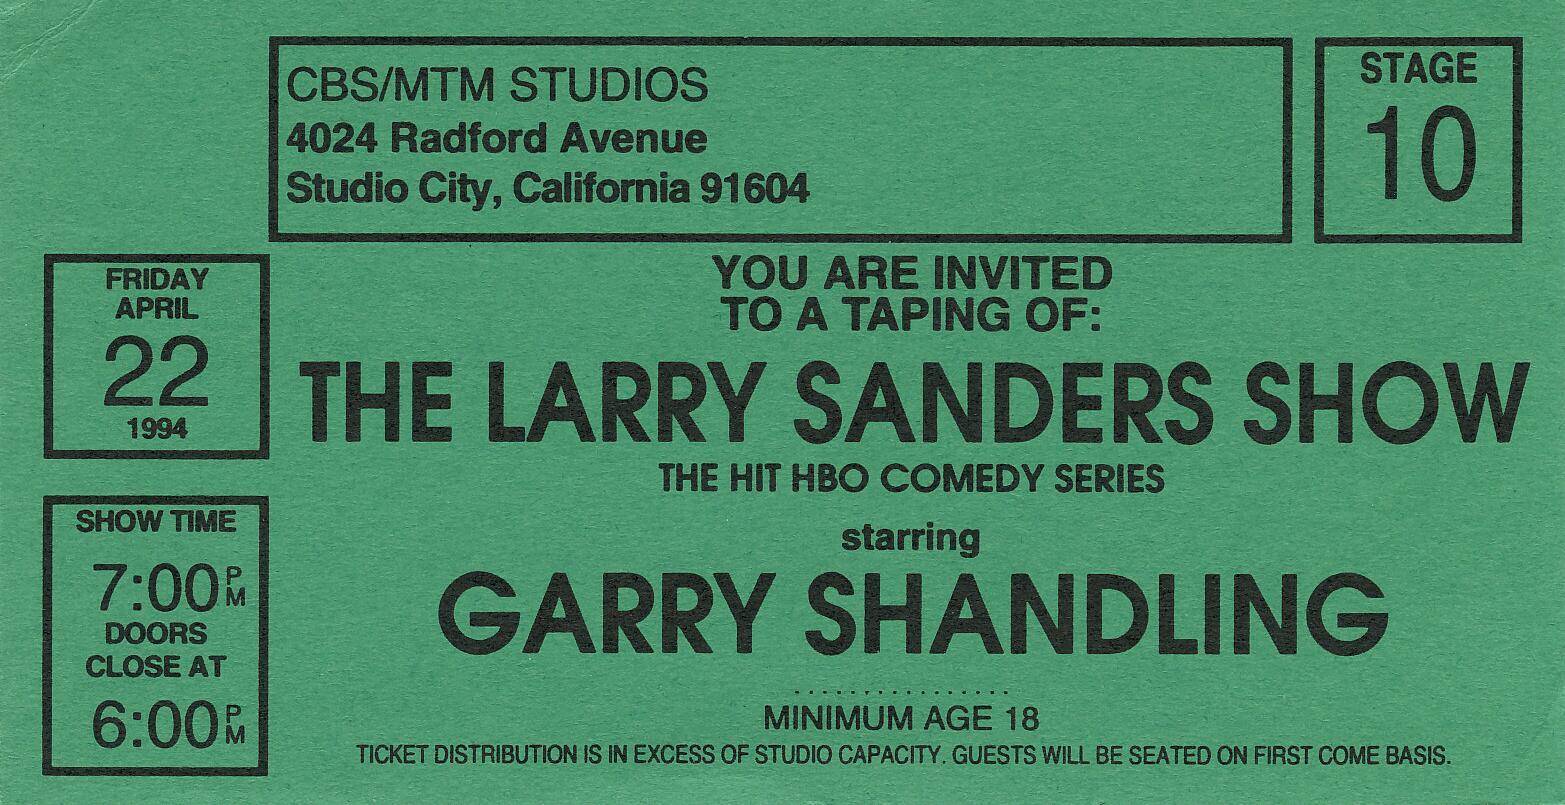 Larry Sanders Show Dvd The Larry Sanders Show